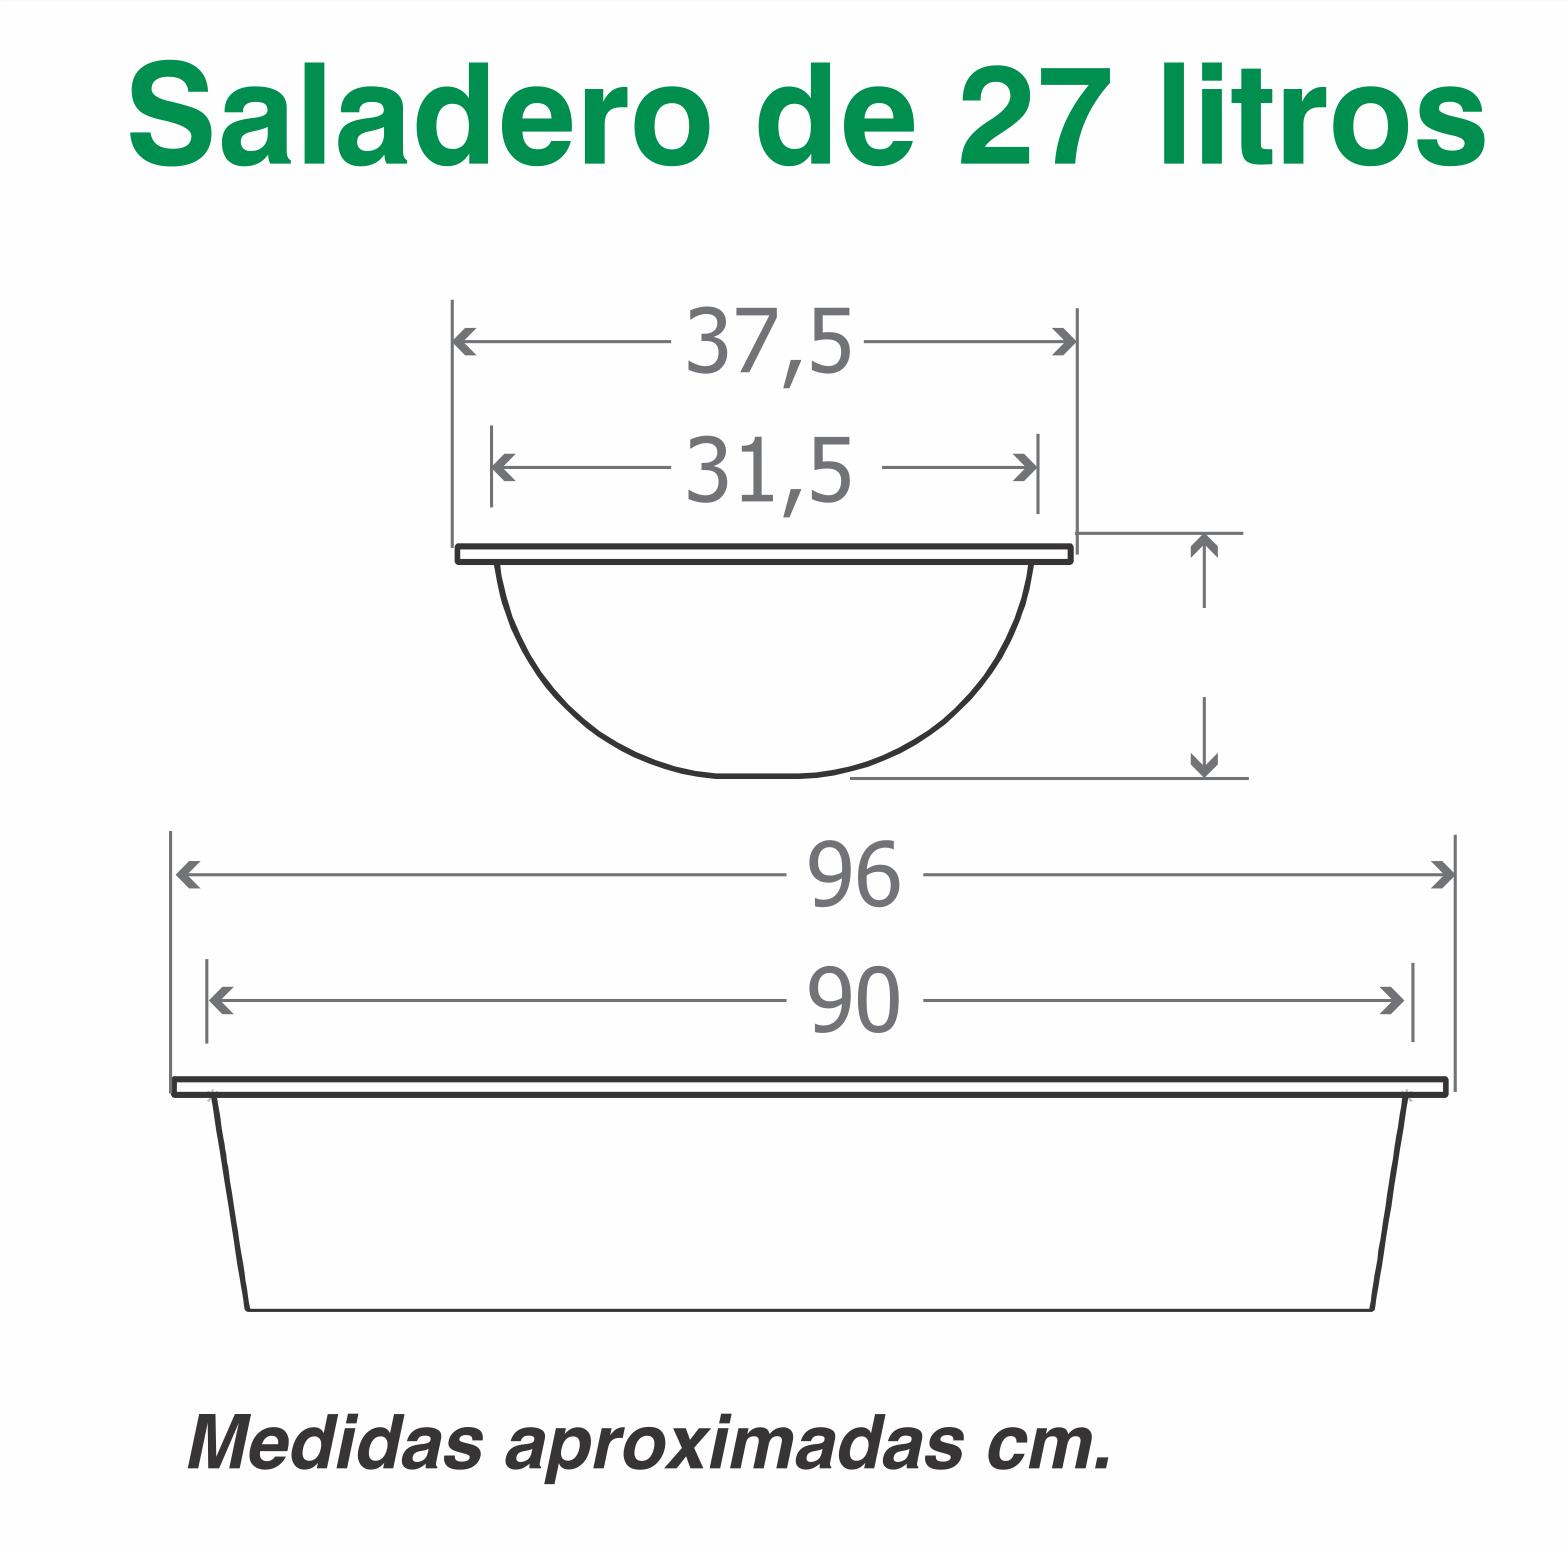 SALADERO 27 LITROS MEDIDAS.png